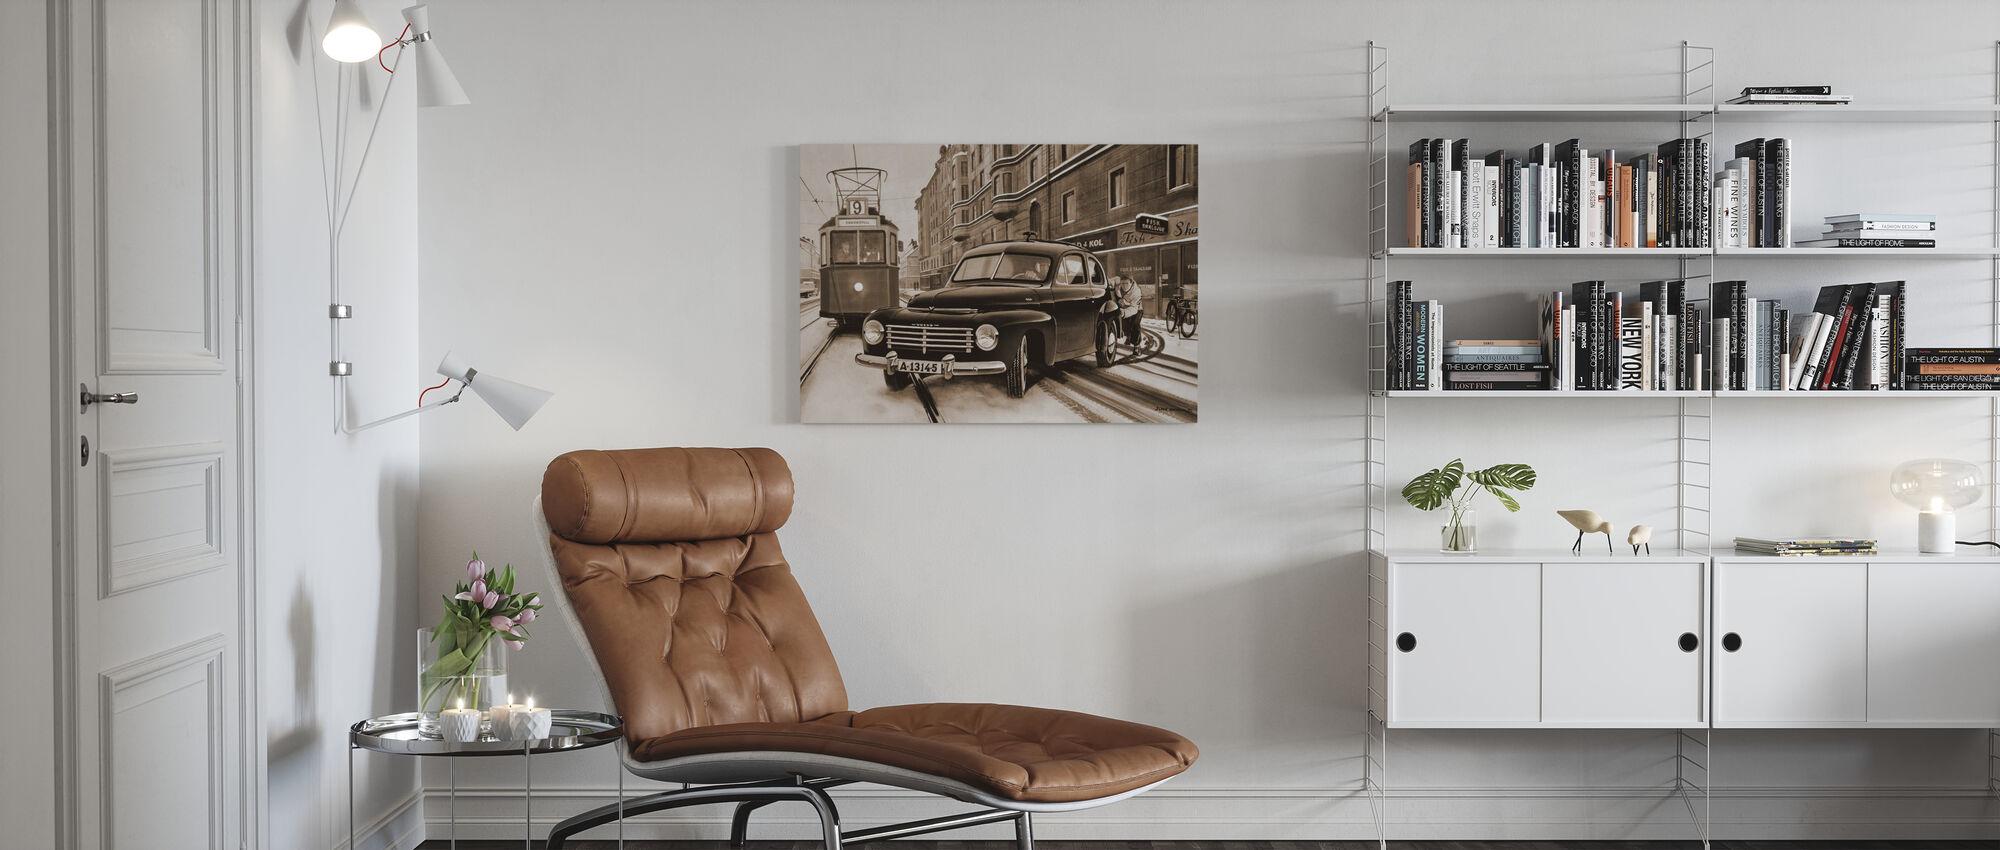 PV In Stockholm, Zweden - Canvas print - Woonkamer